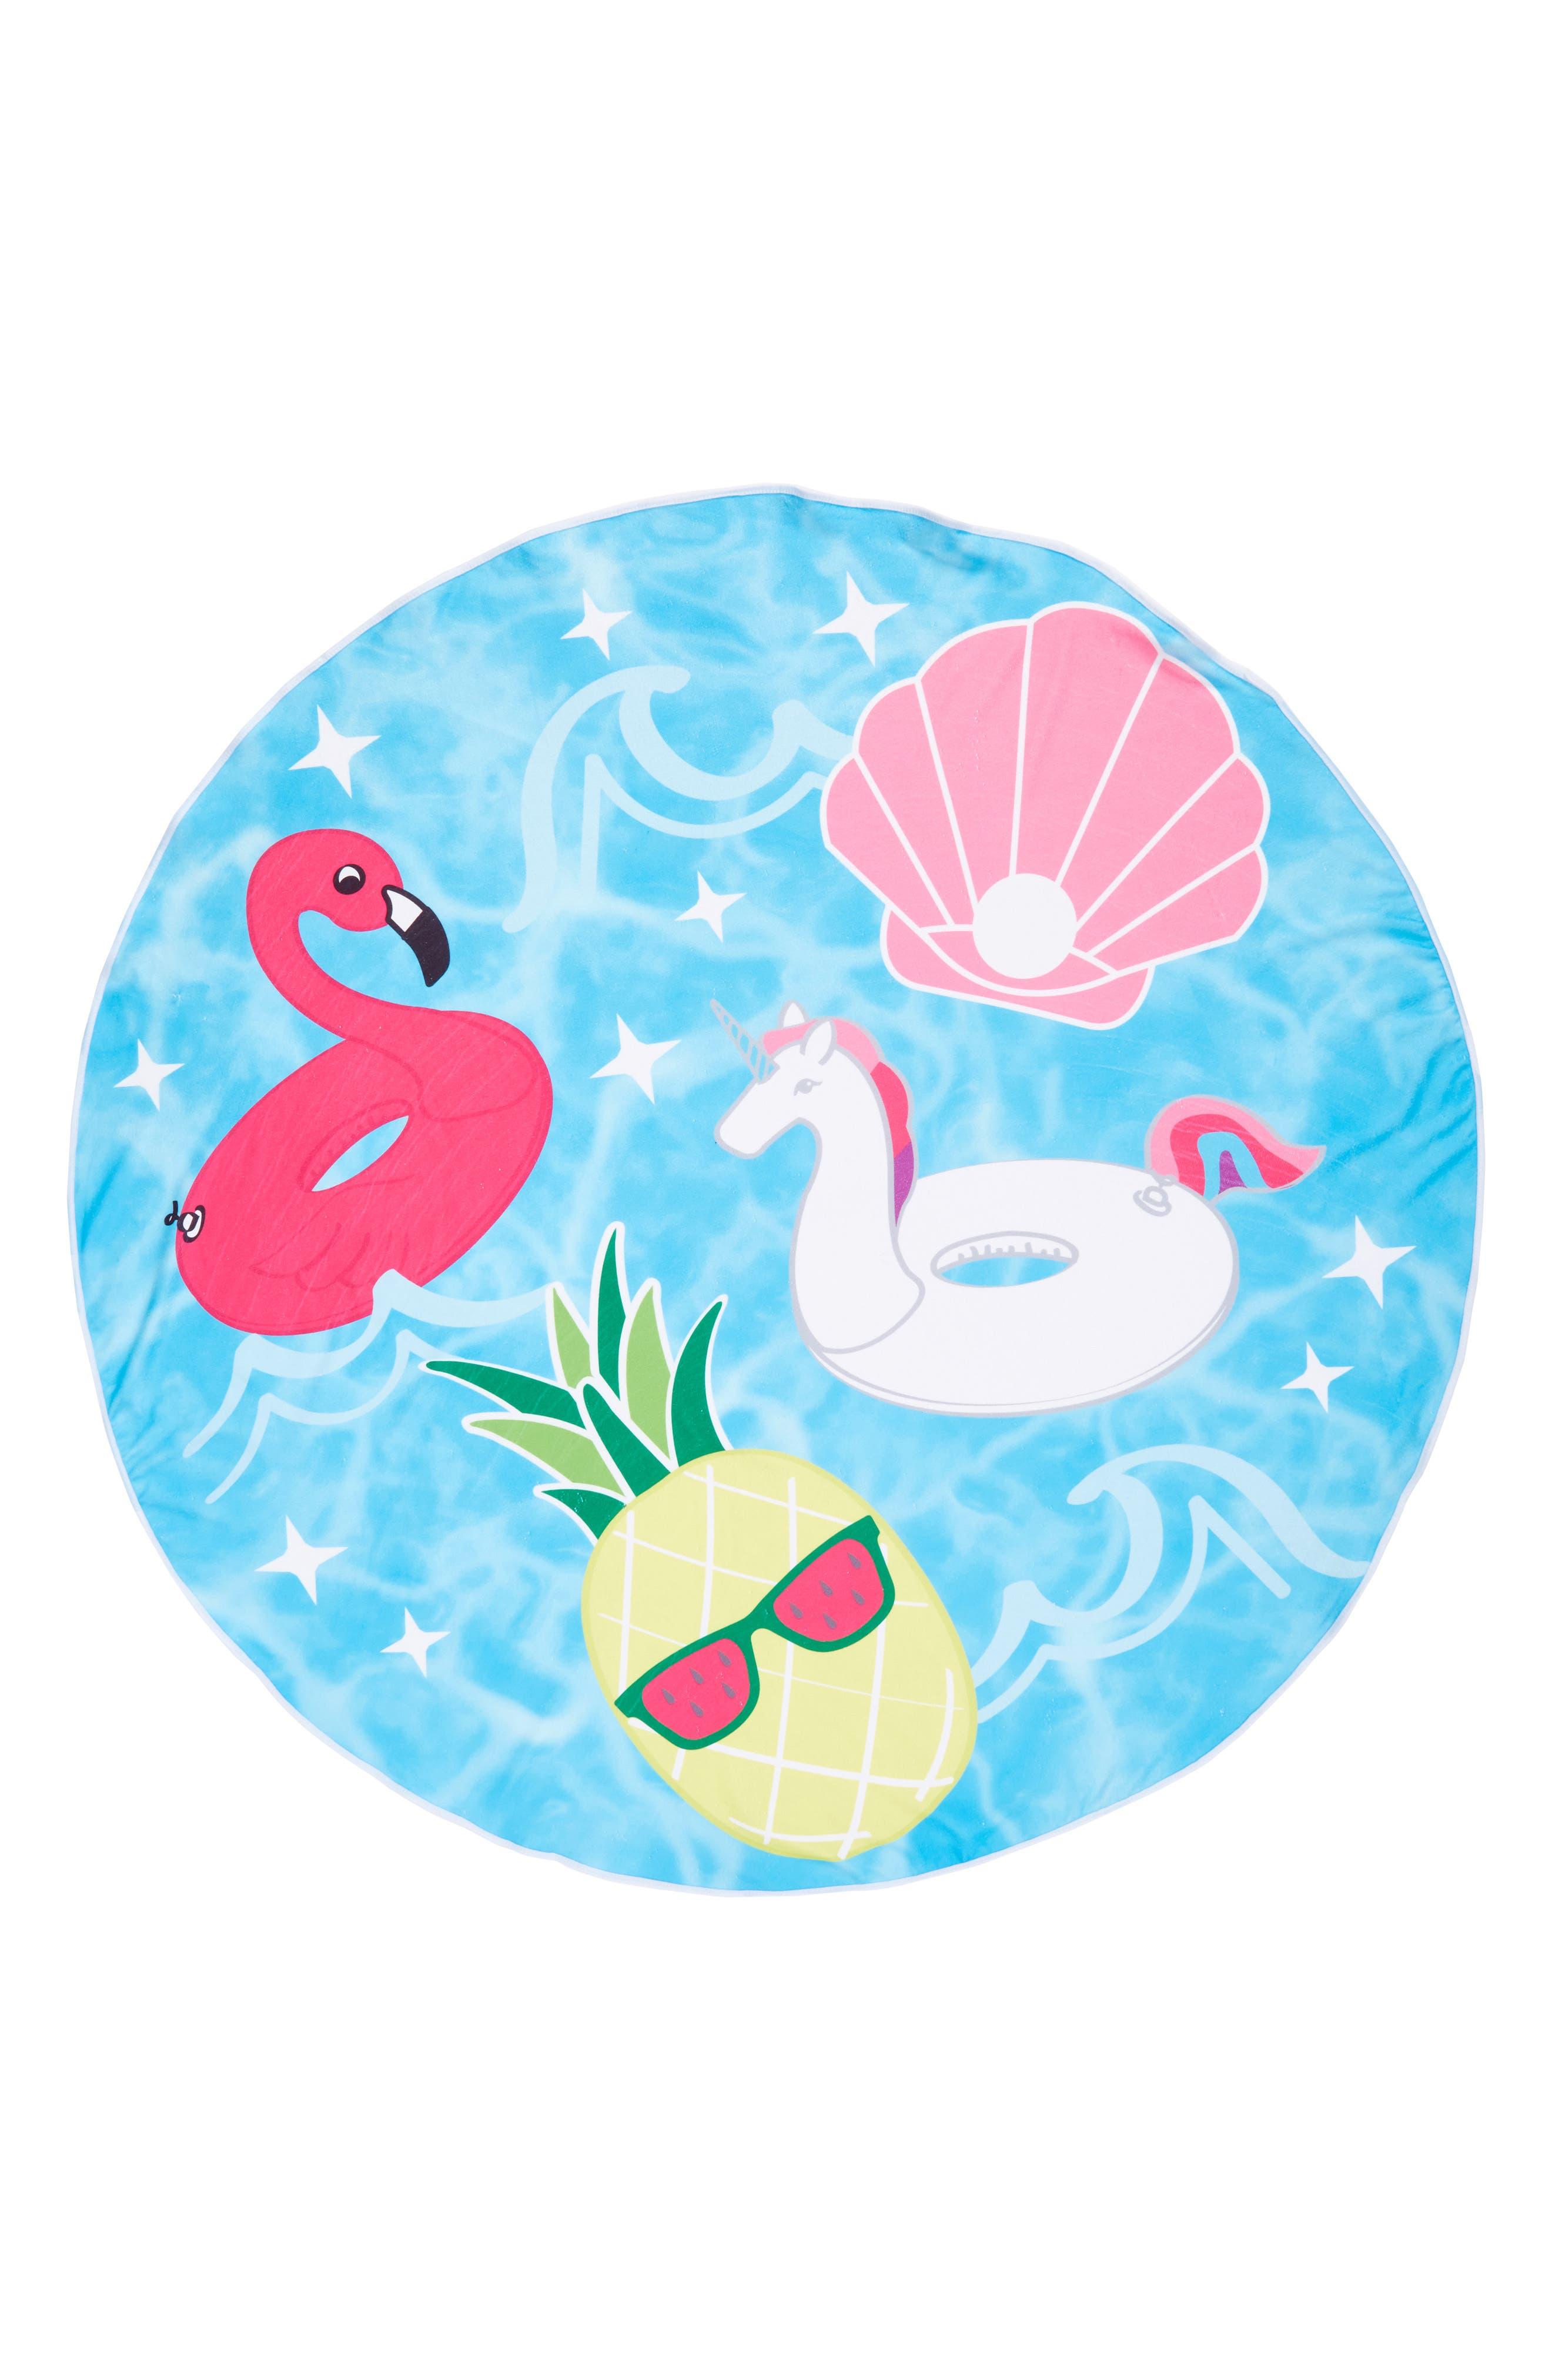 Capelli New York Cool Pool Round Towel